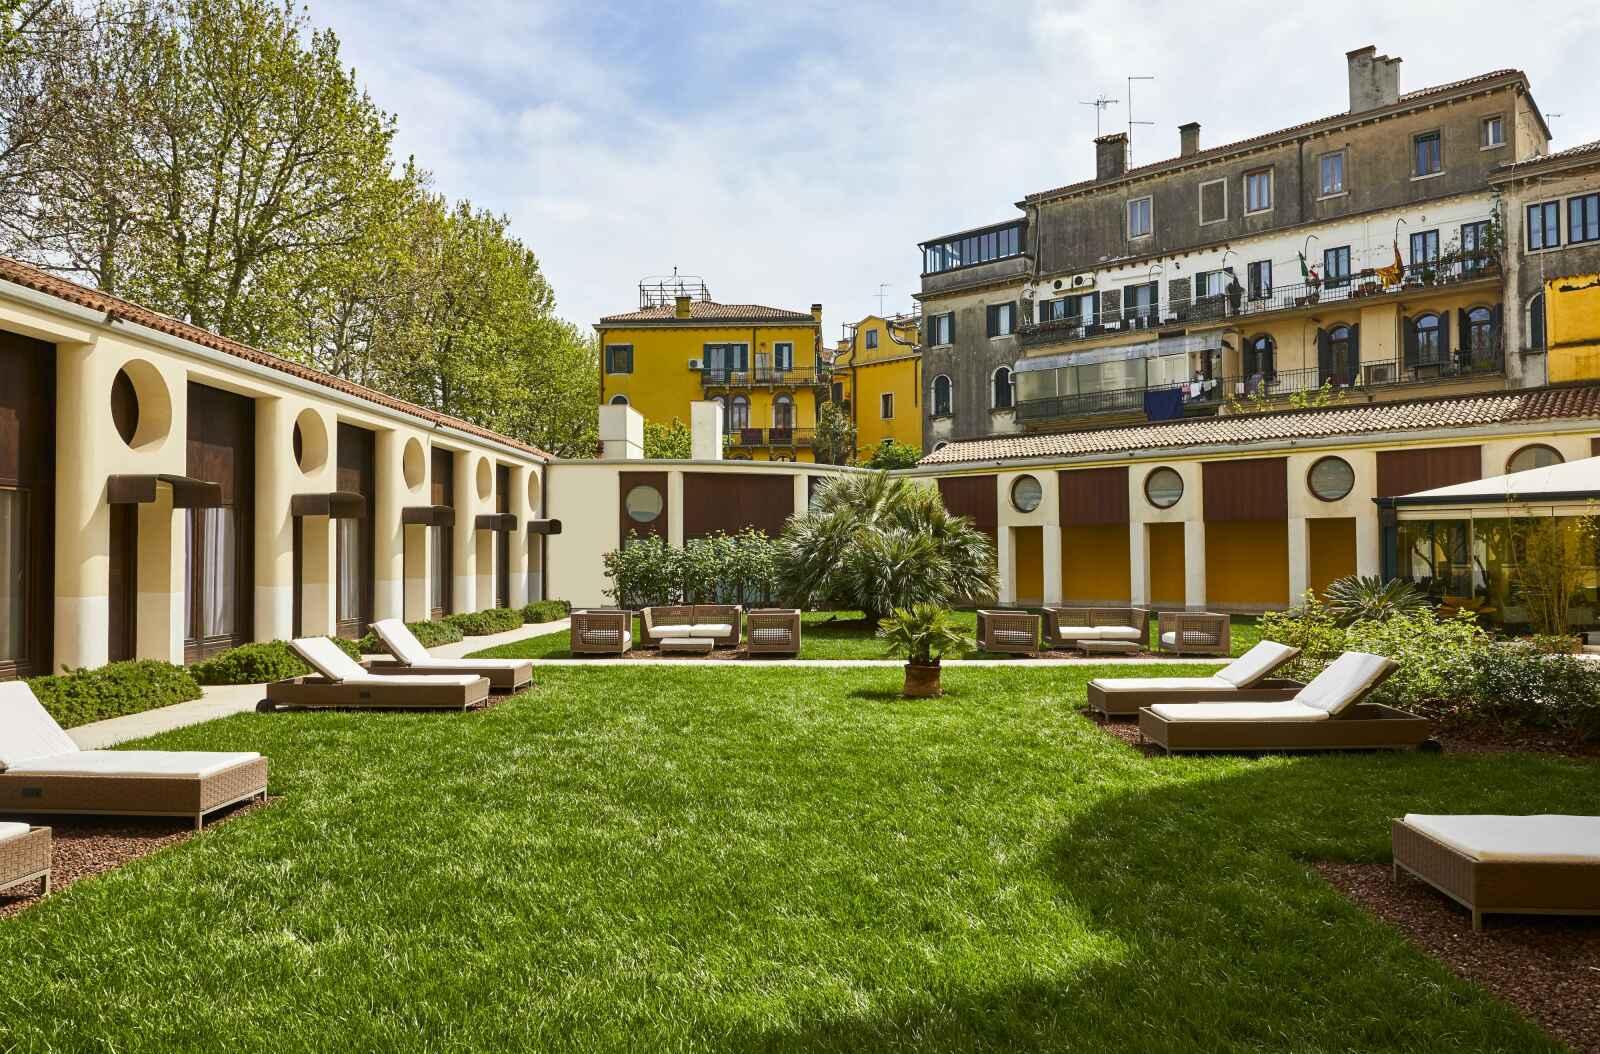 Séjour Italie - Hotel Indigo Venice - Sant'Elena - 4*